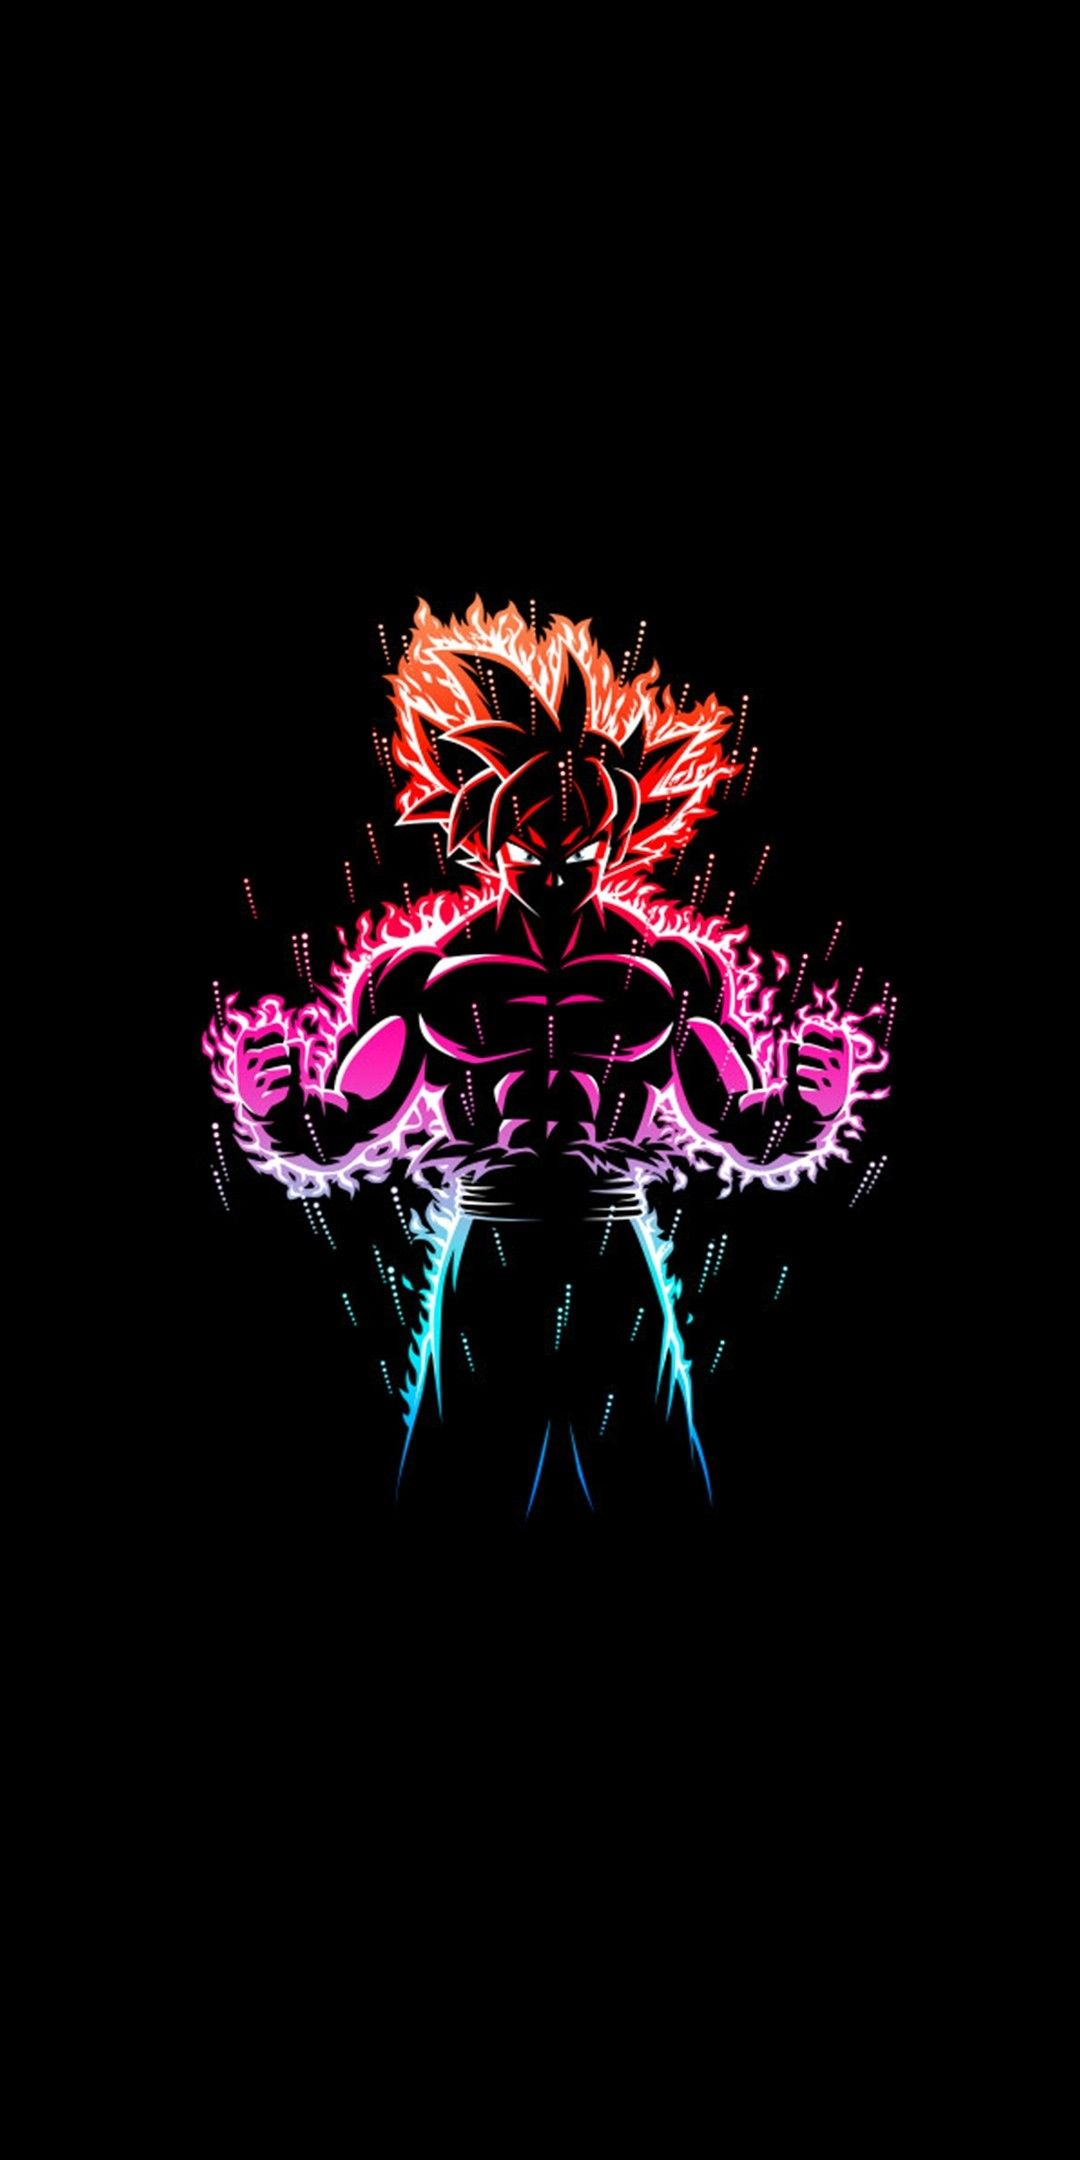 Dragon Ball Pantalla De Goku Fondos De Pantalla Goku Personajes De Goku